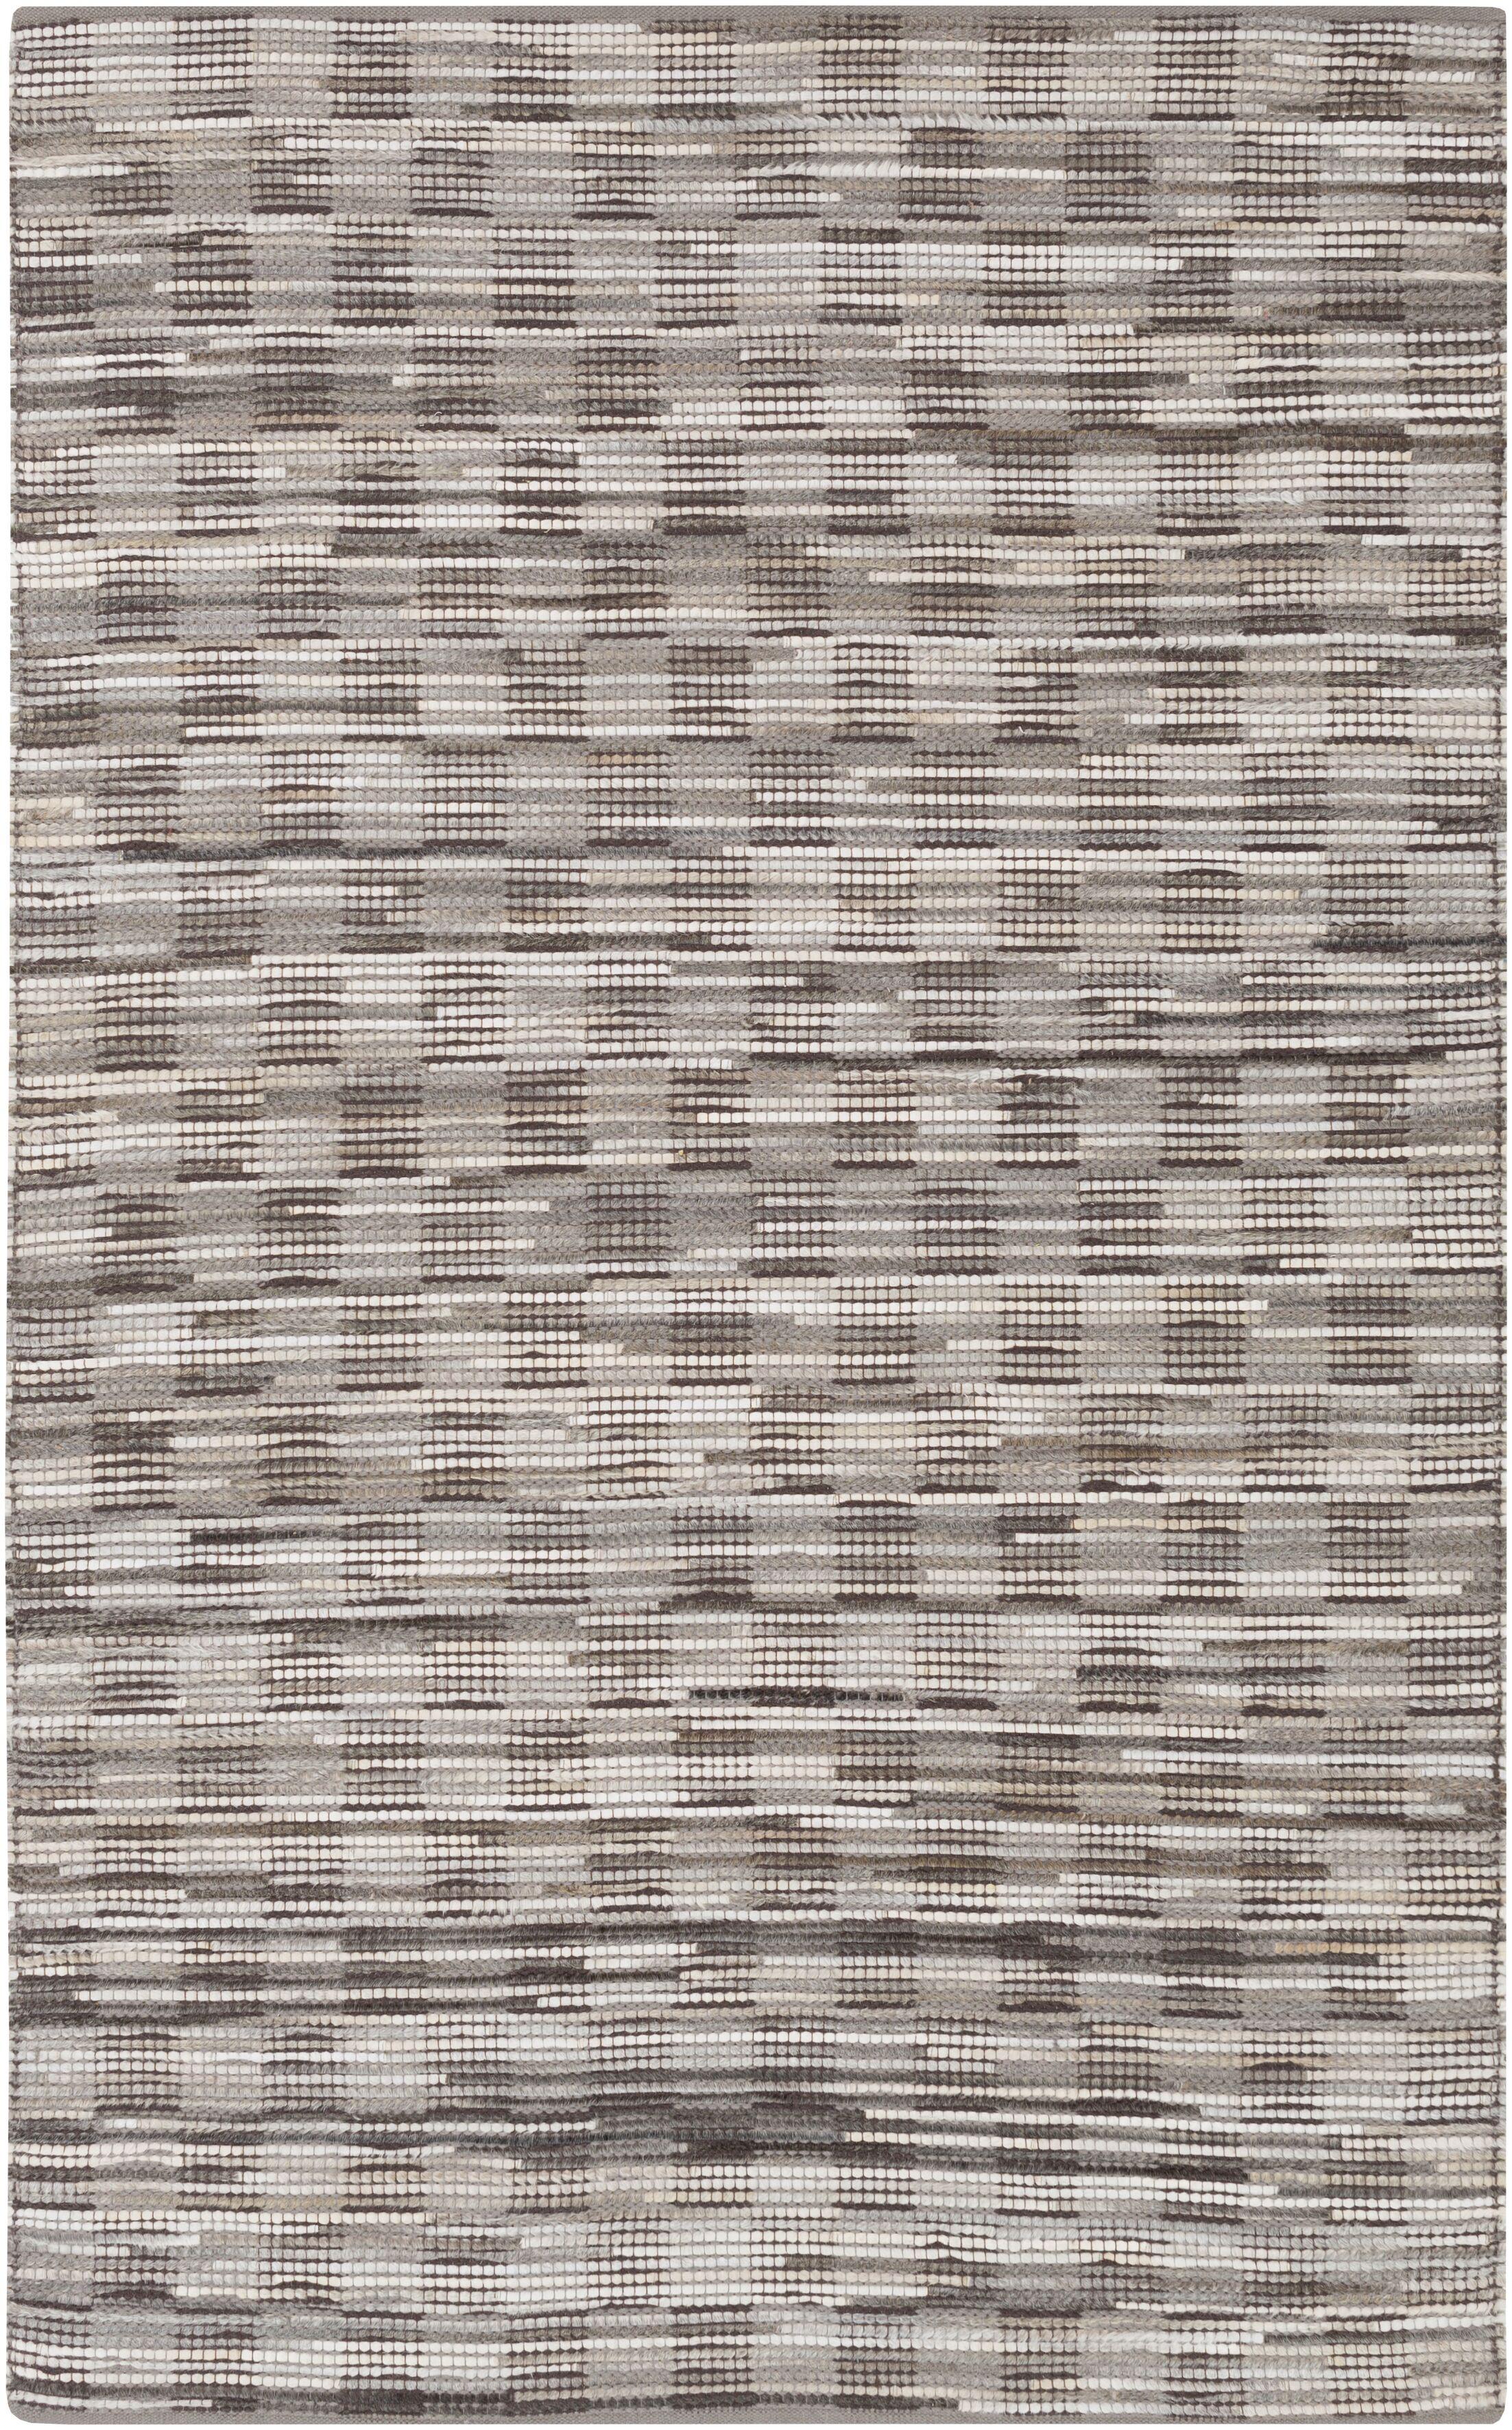 Hand Woven Brown/Gray Area Rug Rug Size: Rectangle 8' x 10'